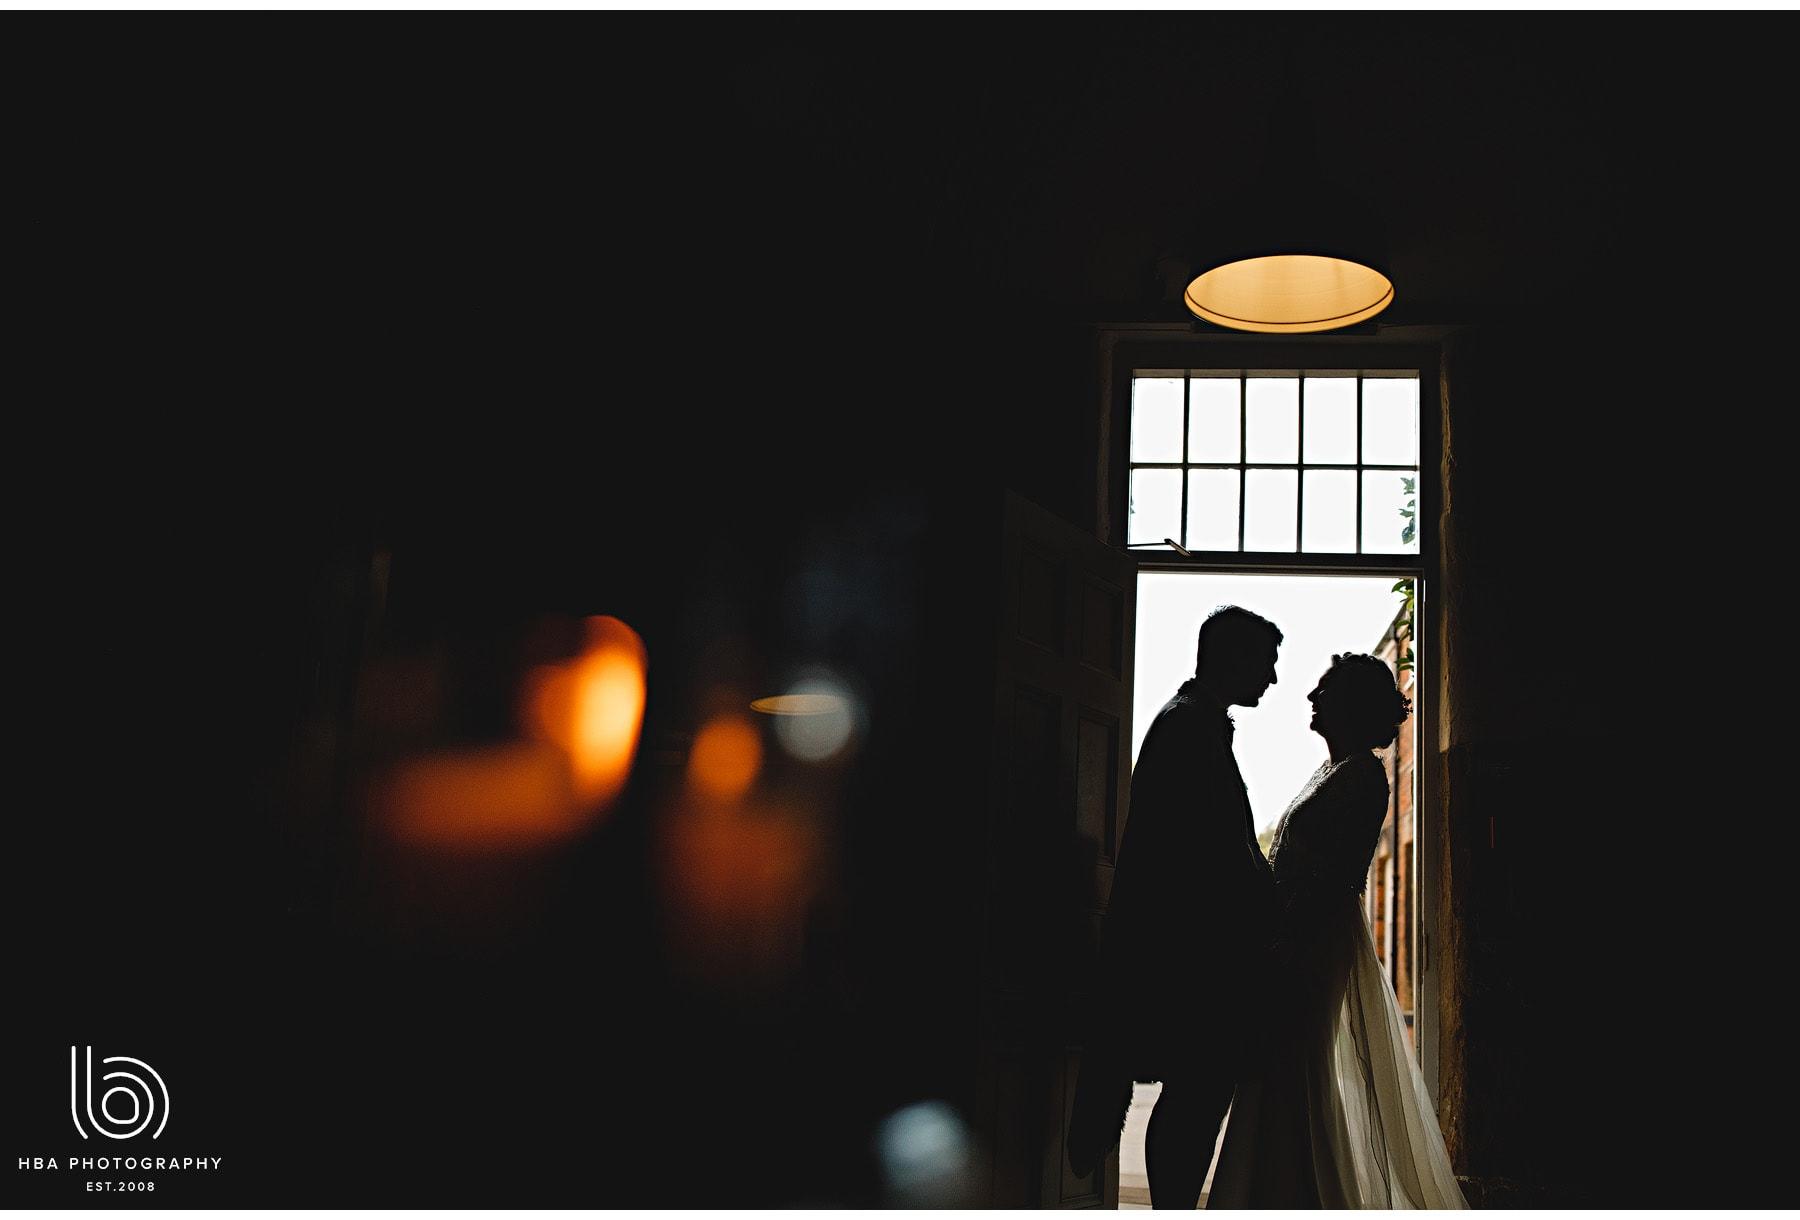 the bride & groom in the doorway in silhouette